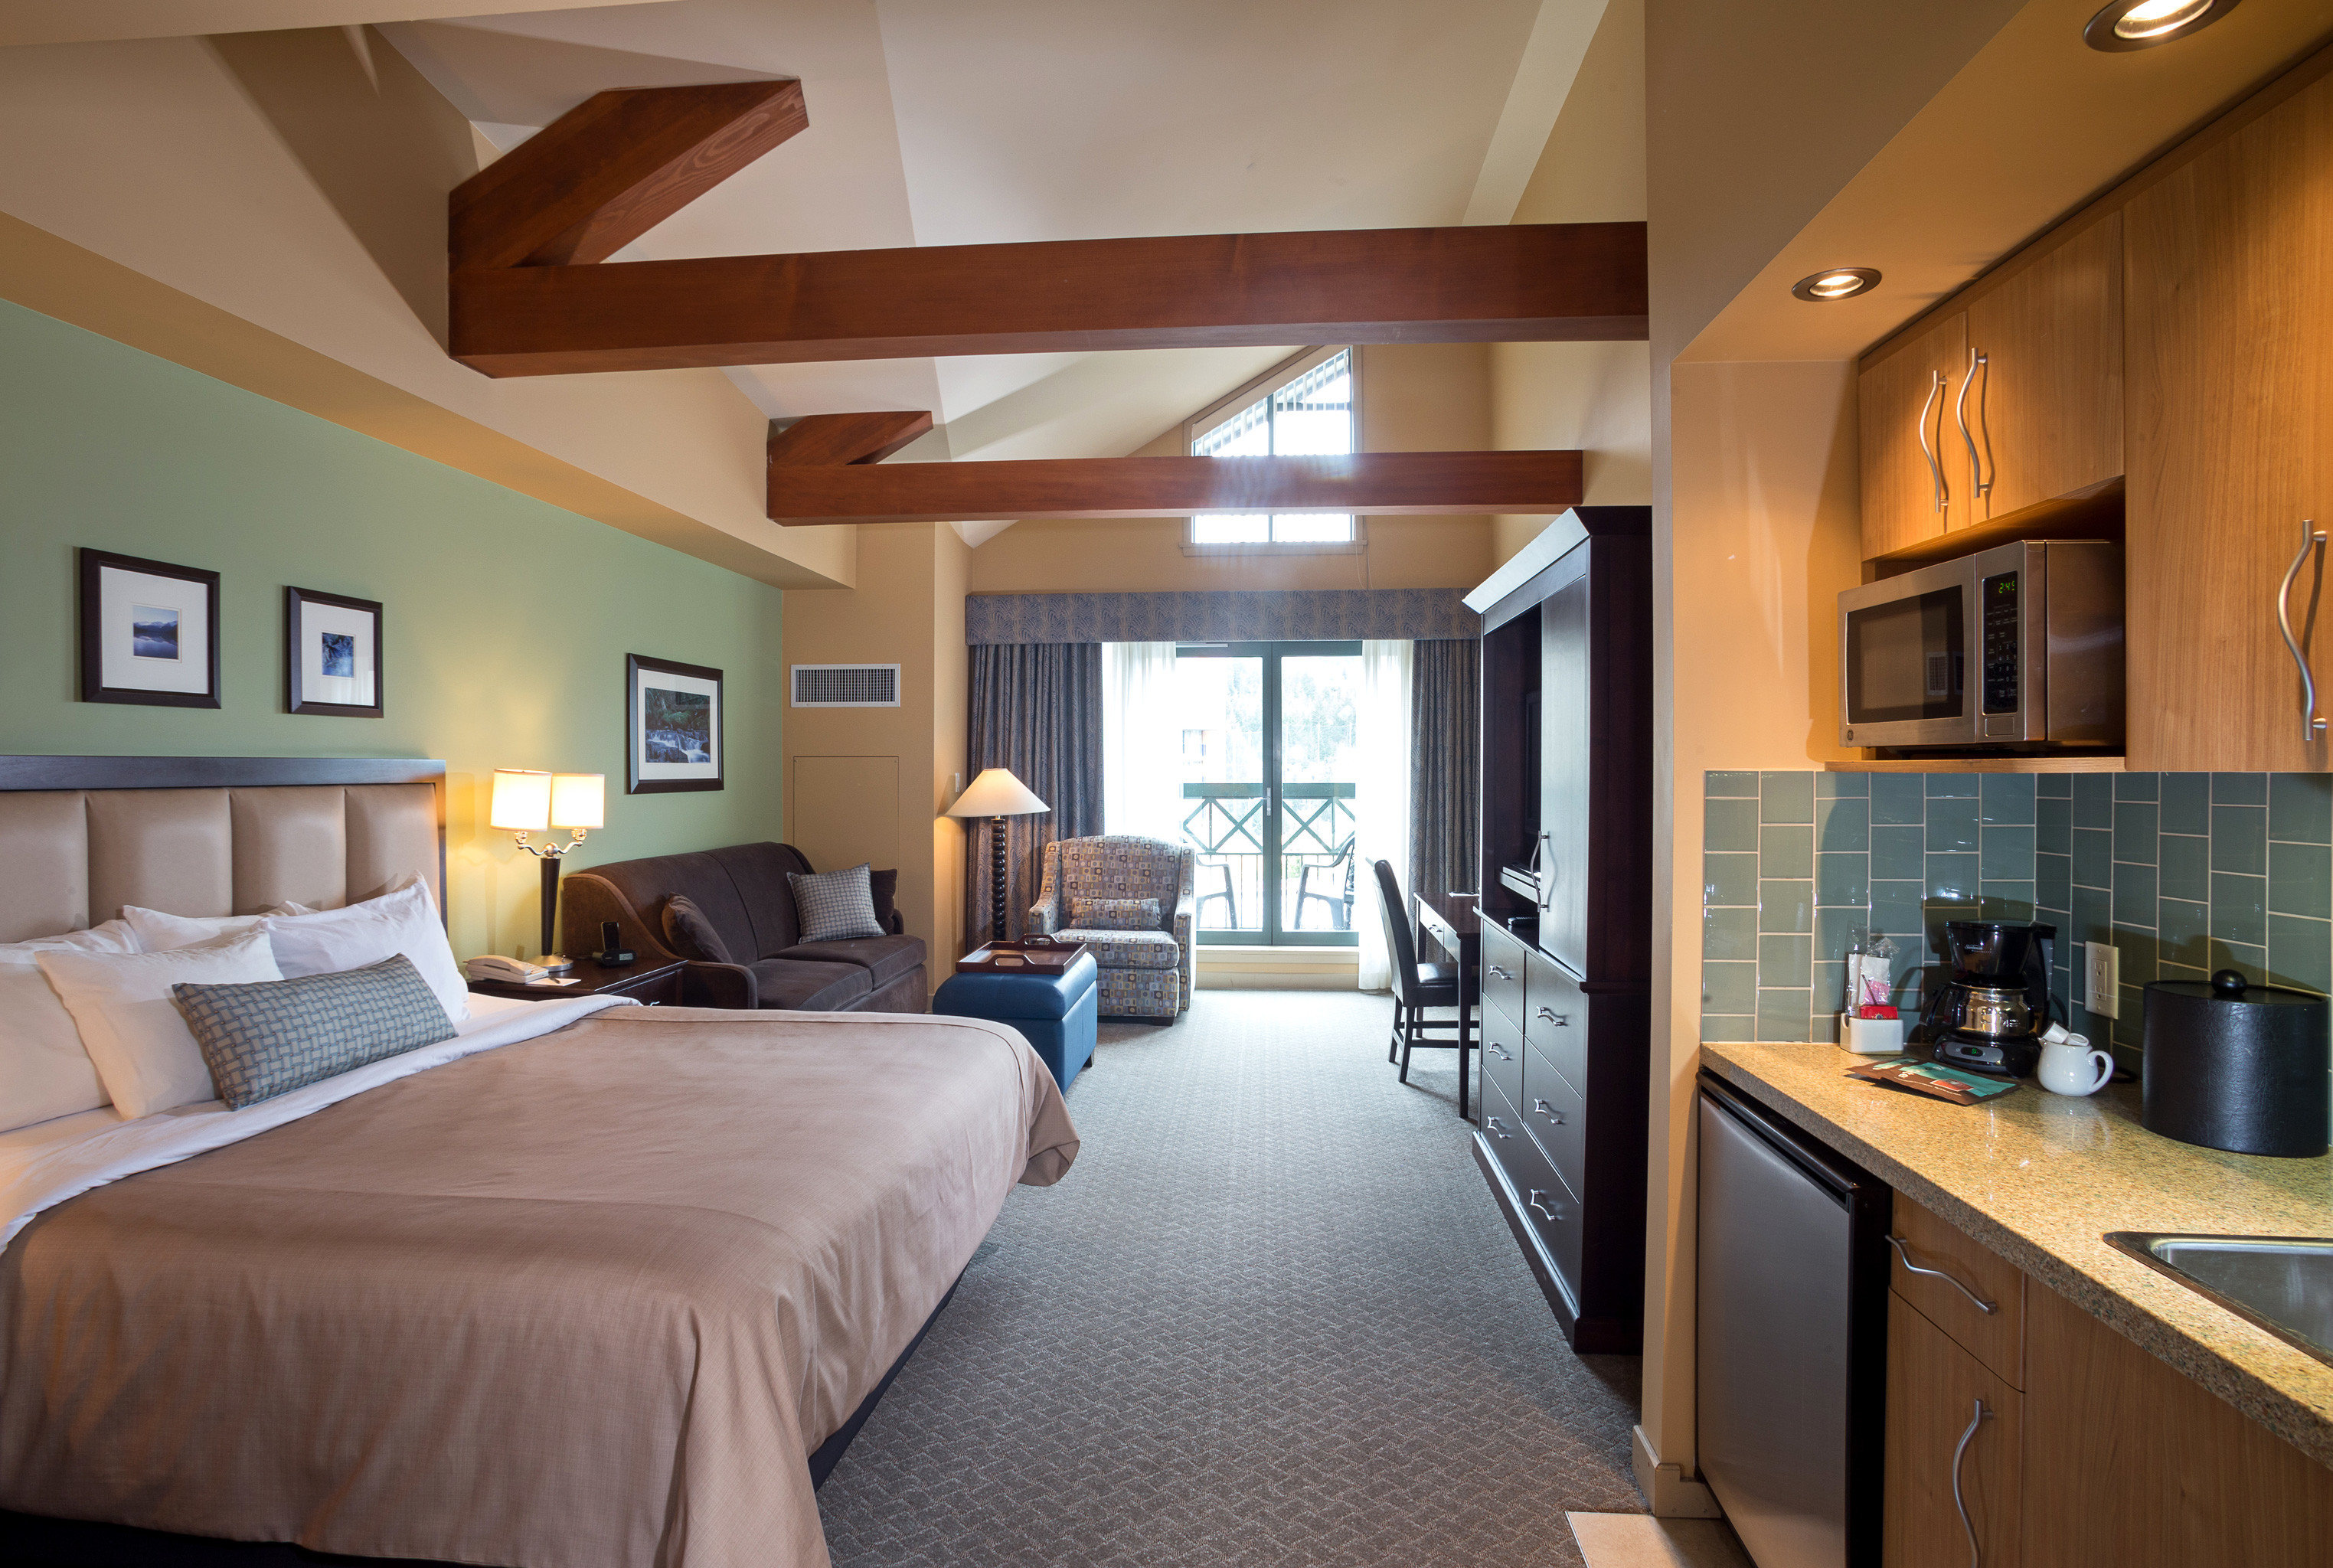 Bedroom Lodge Lounge Scenic views property home Suite hardwood living room cottage condominium